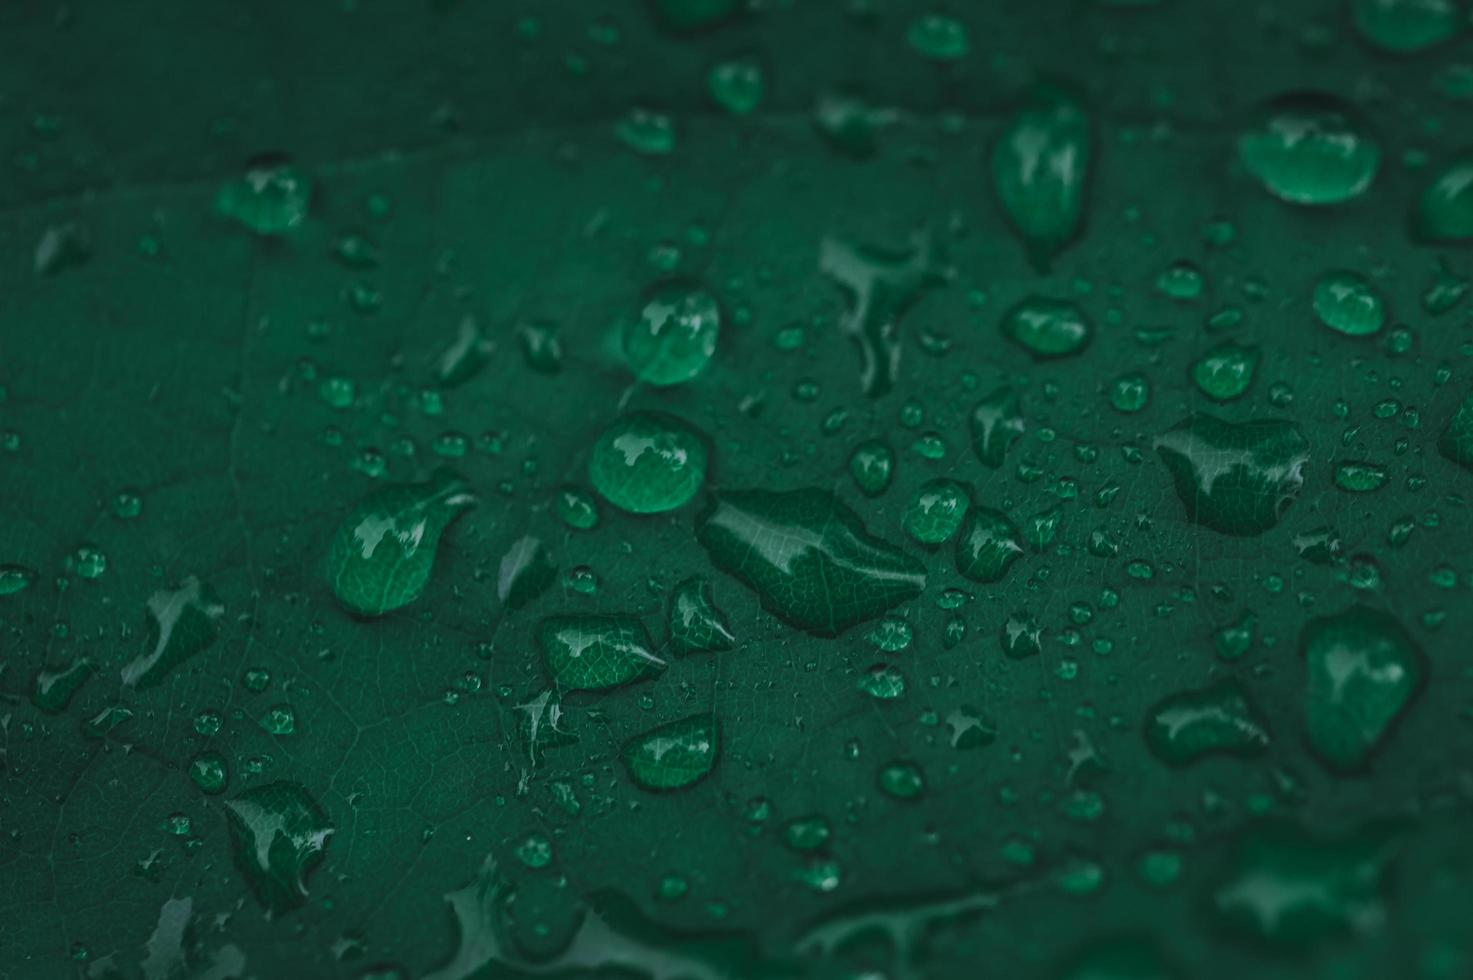 la lluvia cae sobre la hoja verde foto